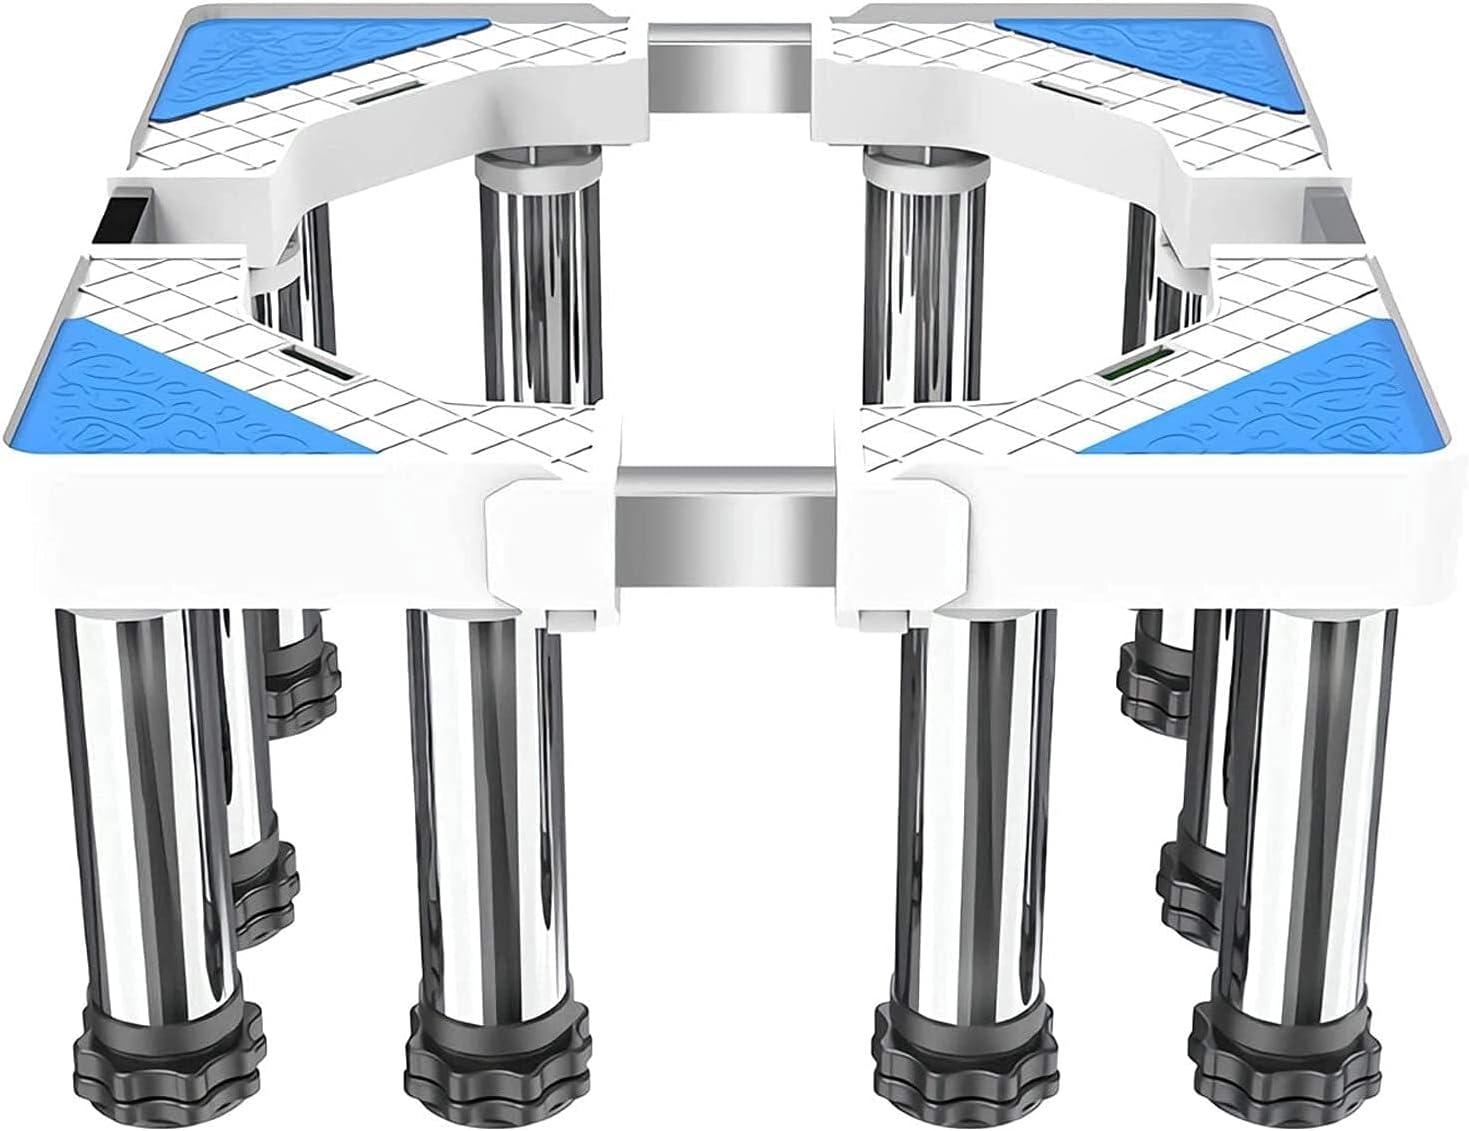 2021 Mix Buzsu Arıtma Washing Machine OFFicial Base Universal Telescopic